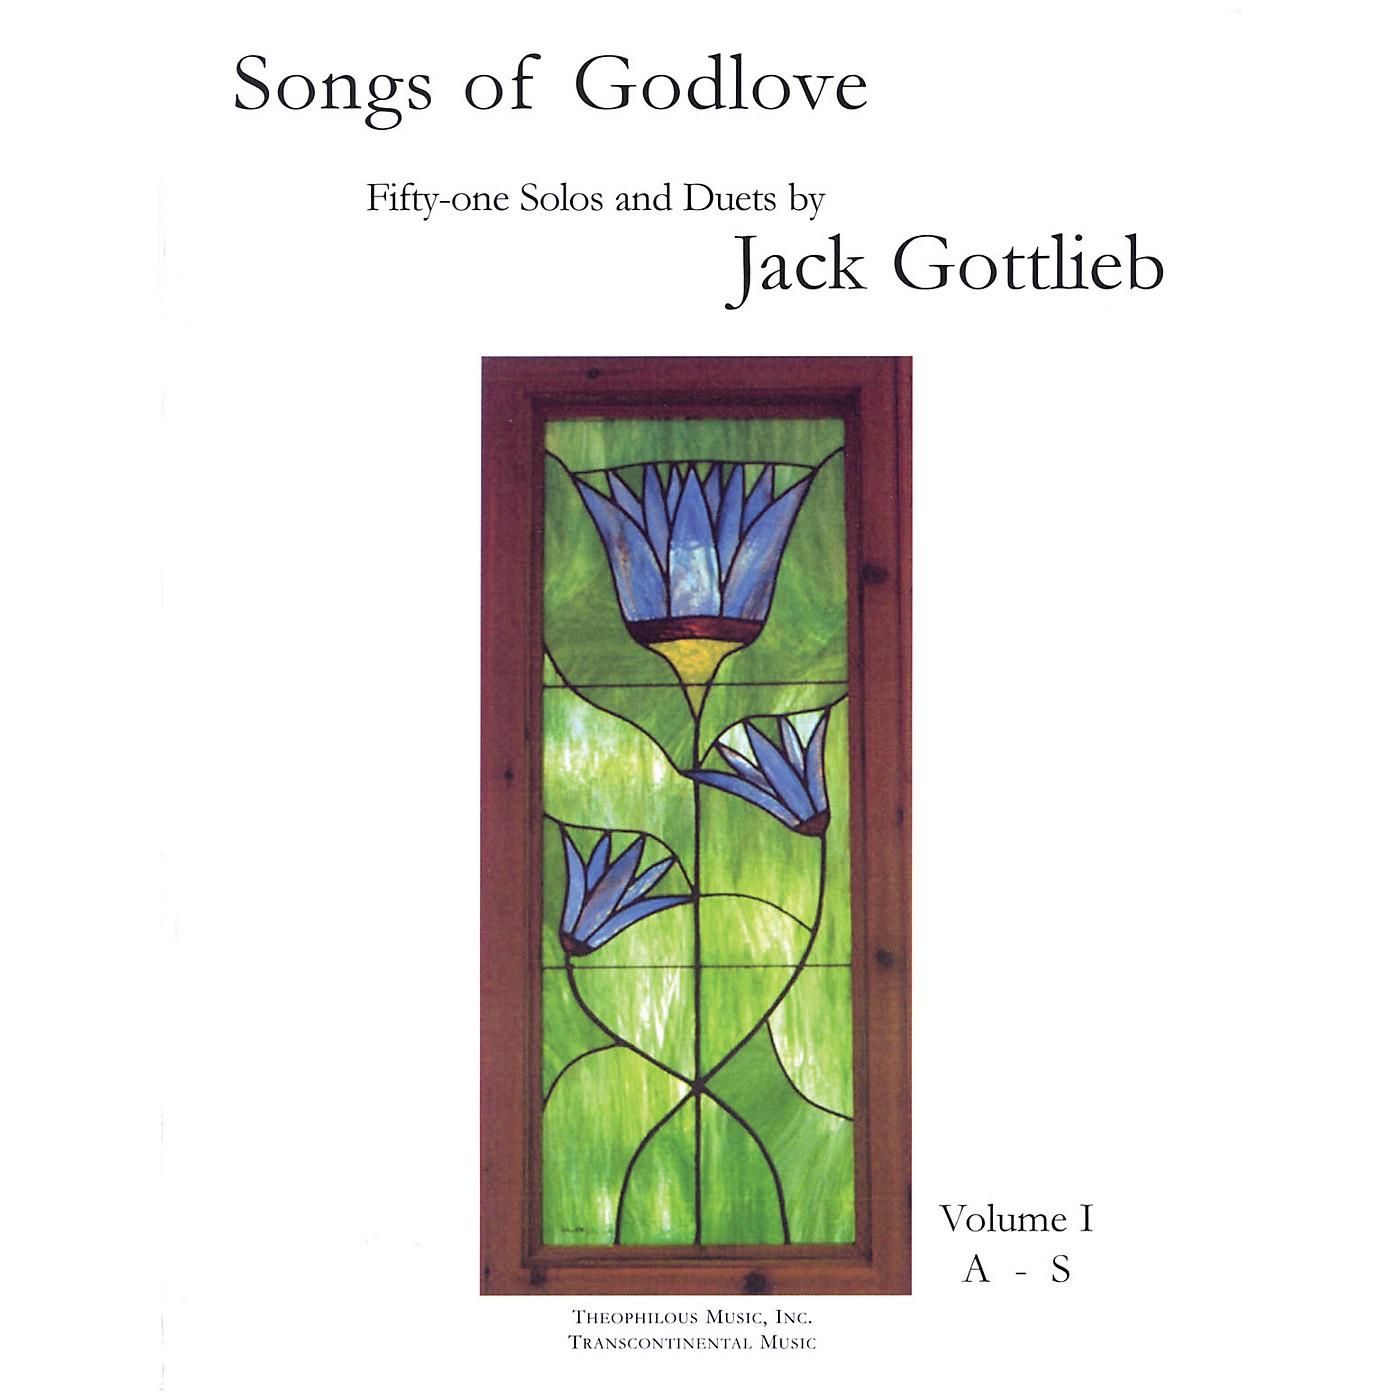 Transcontinental Music Songs of Godlove, Volume I: A-S (51 Solos and Duets) Transcontinental Music Folios Series thumbnail